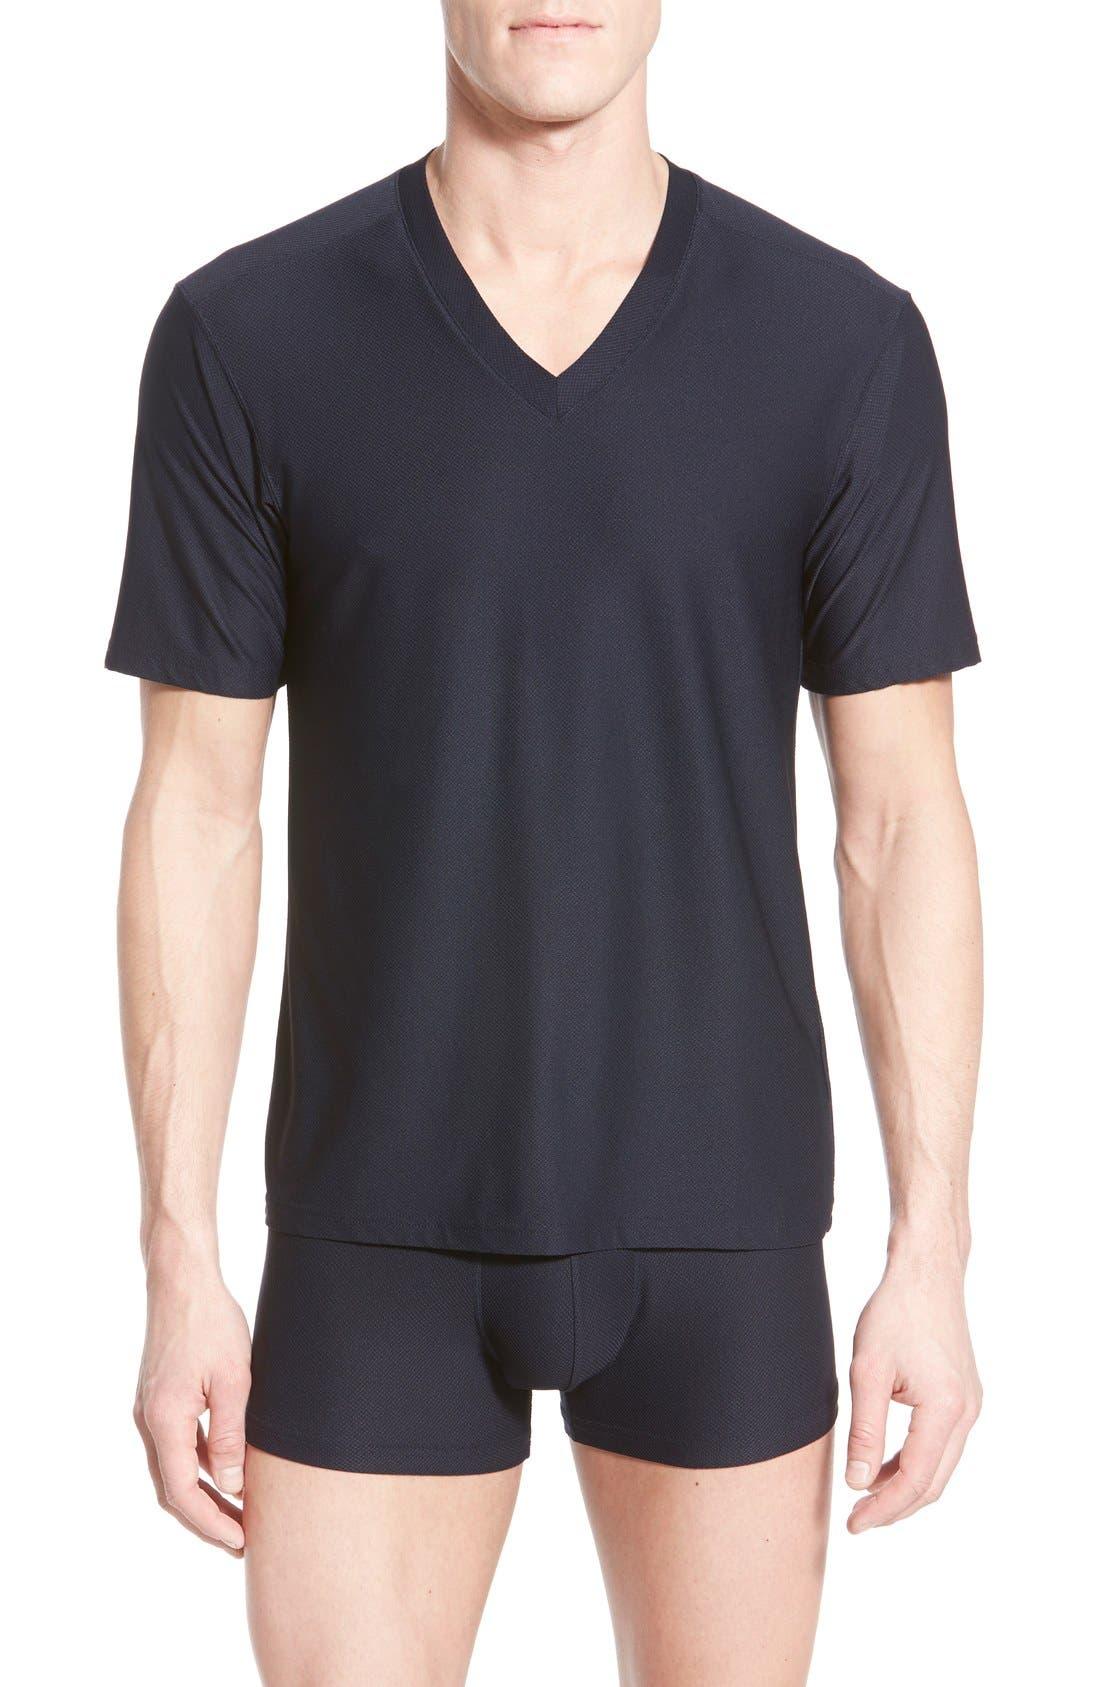 ExOfficio 'Give-N-Go' Mesh V-Neck T-Shirt